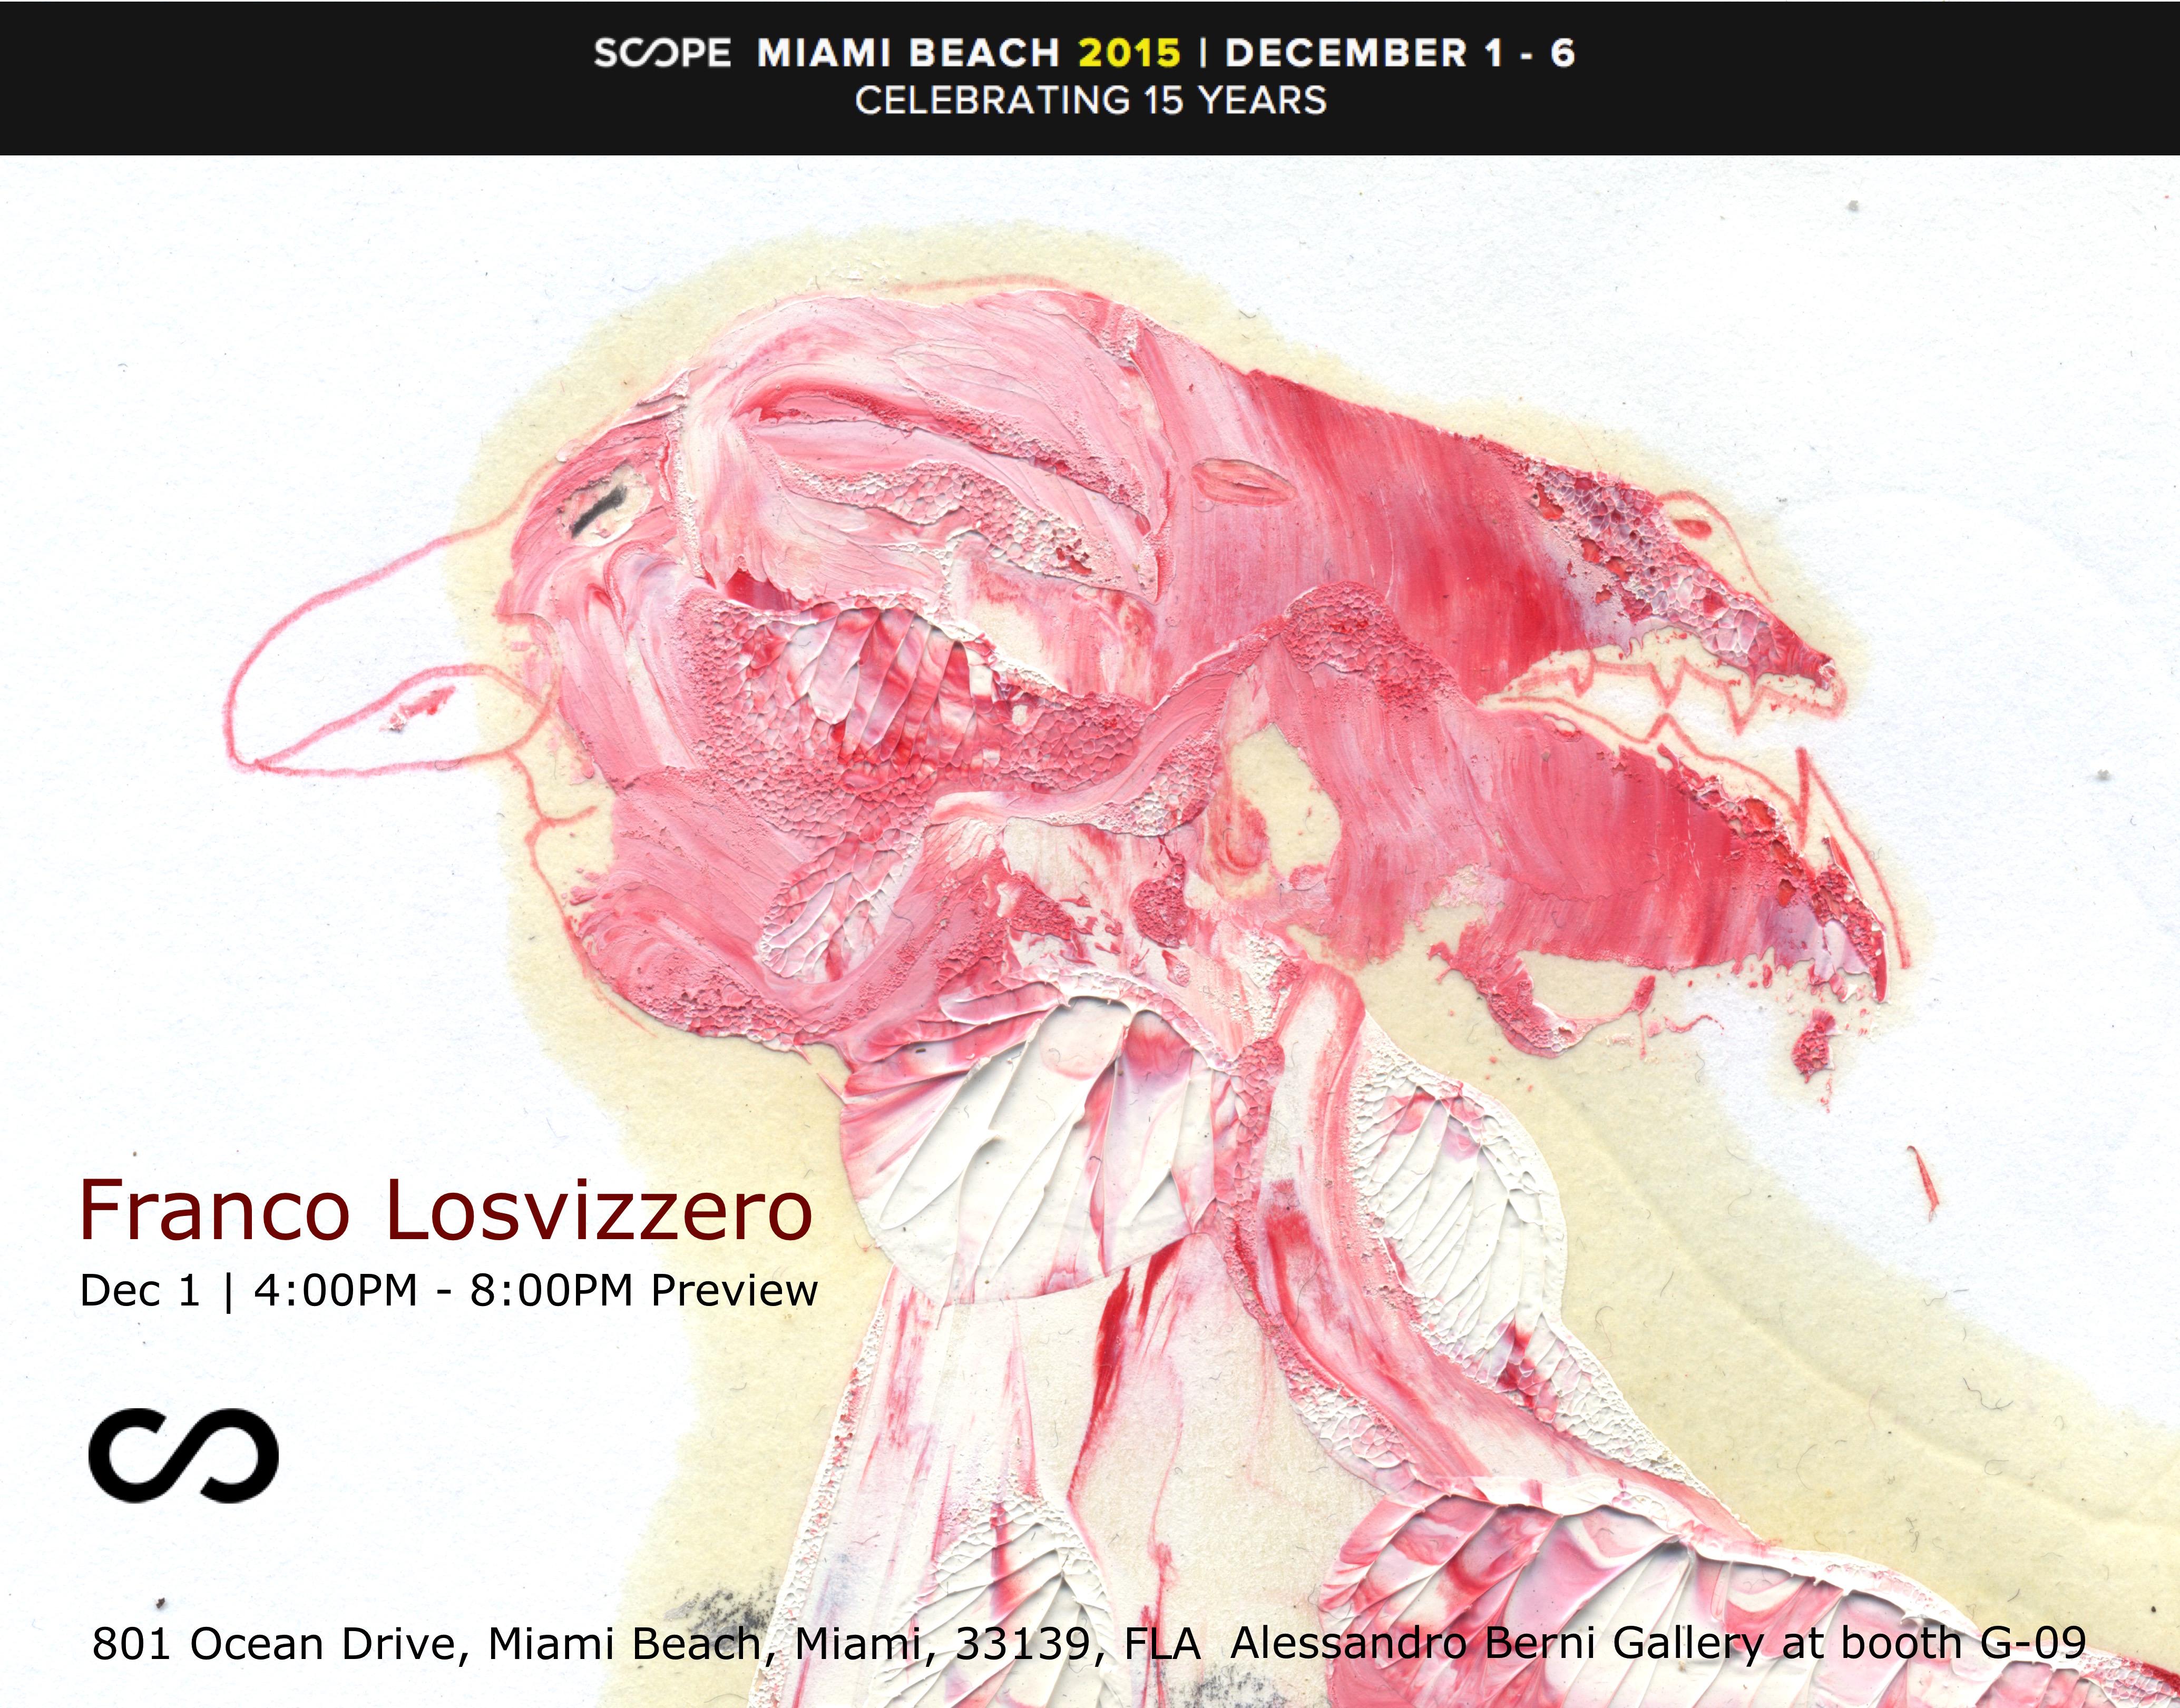 Scope - Art Basel Miami Beach 2015